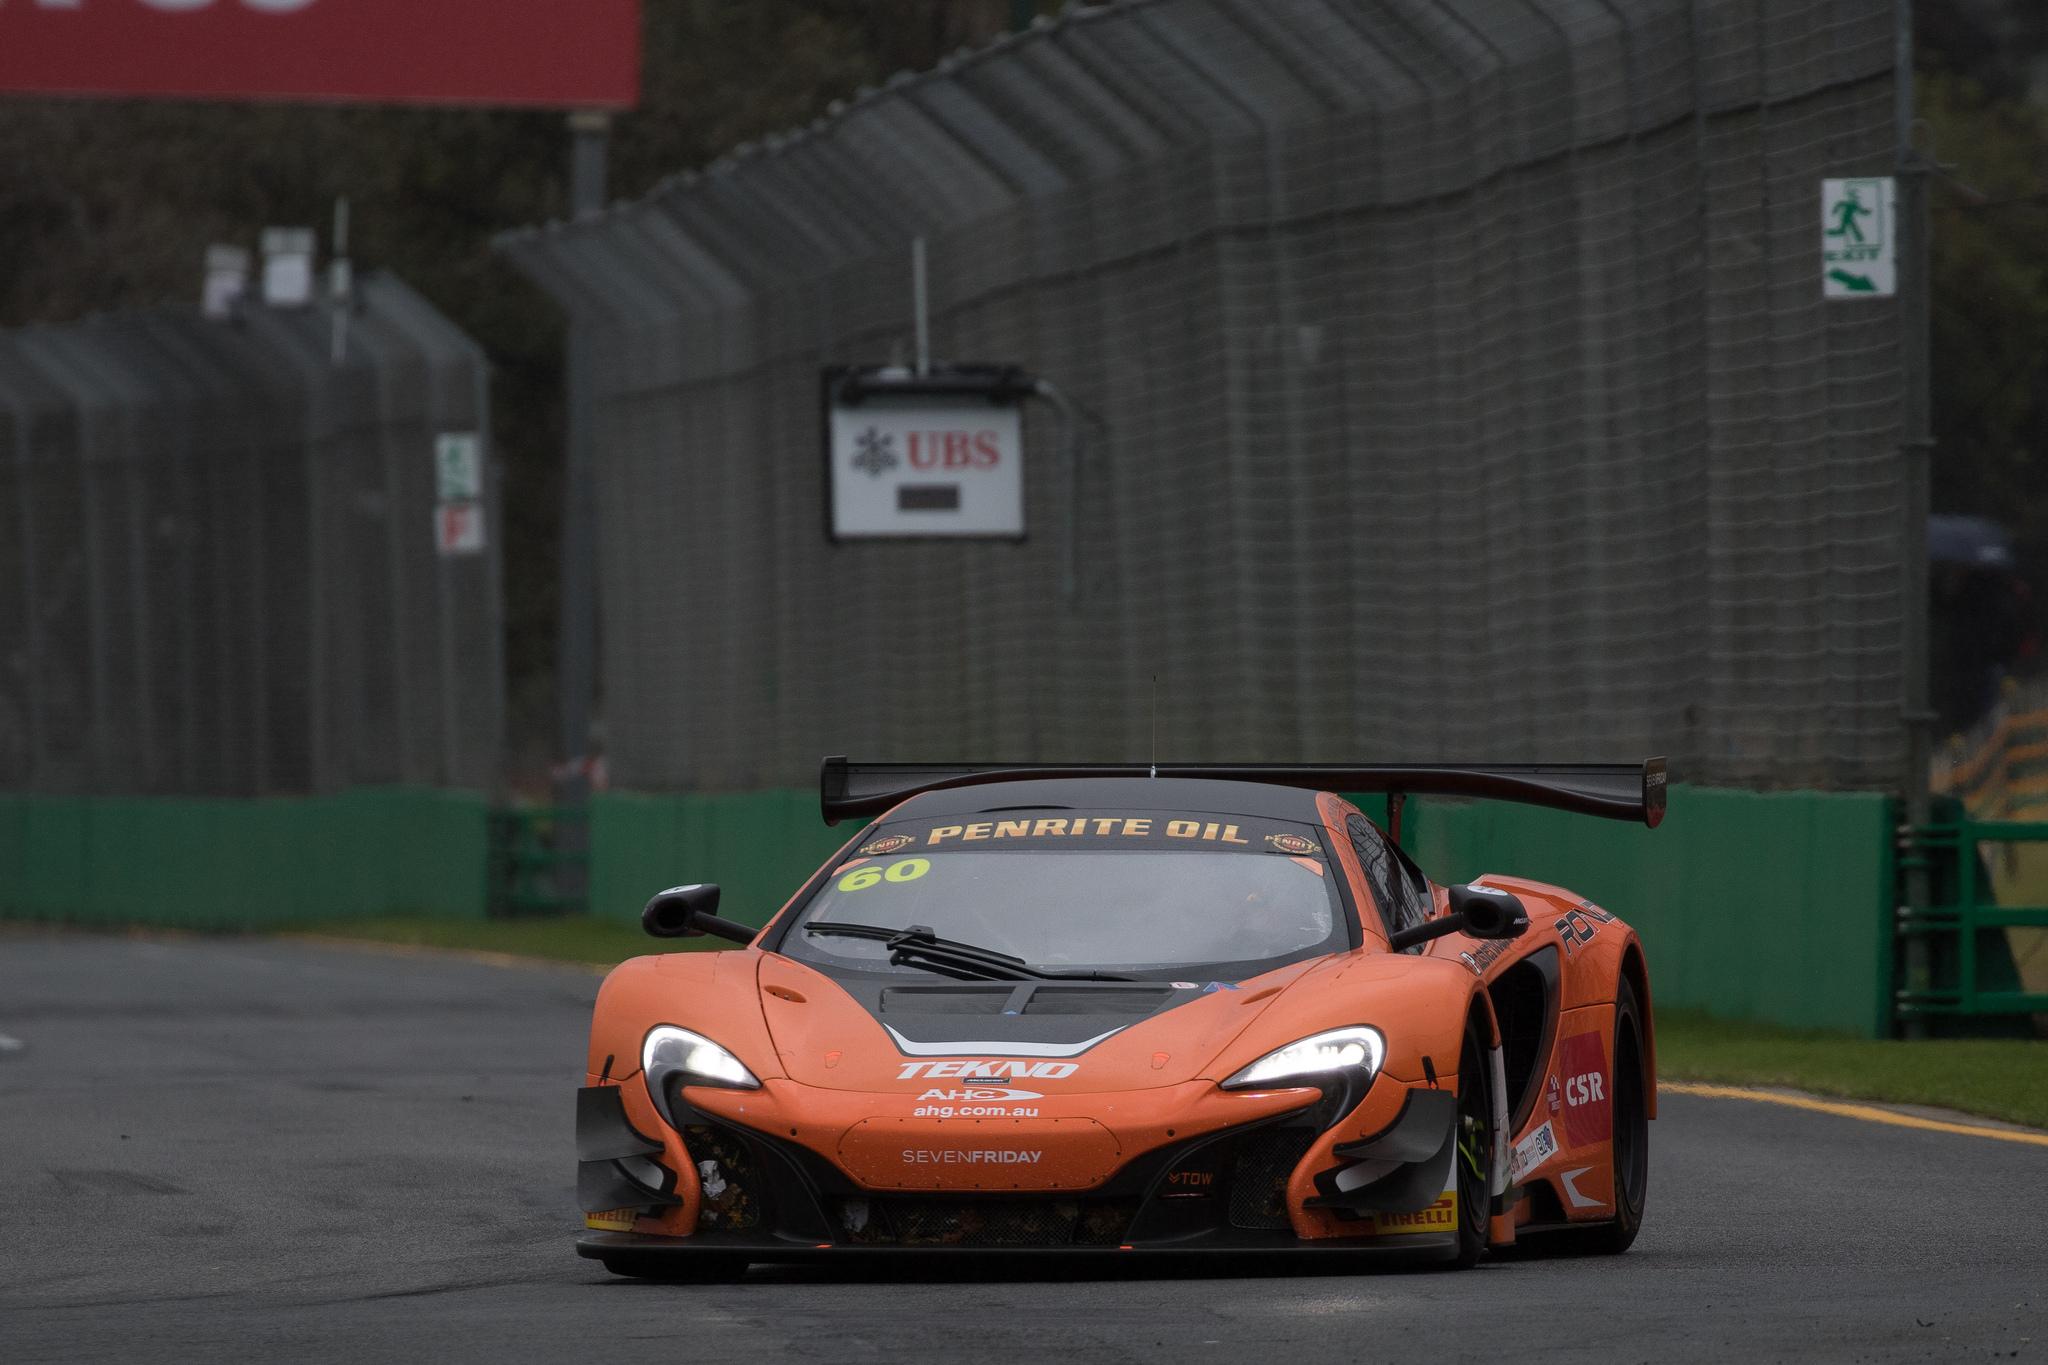 Morcom wins dramatic Race 2